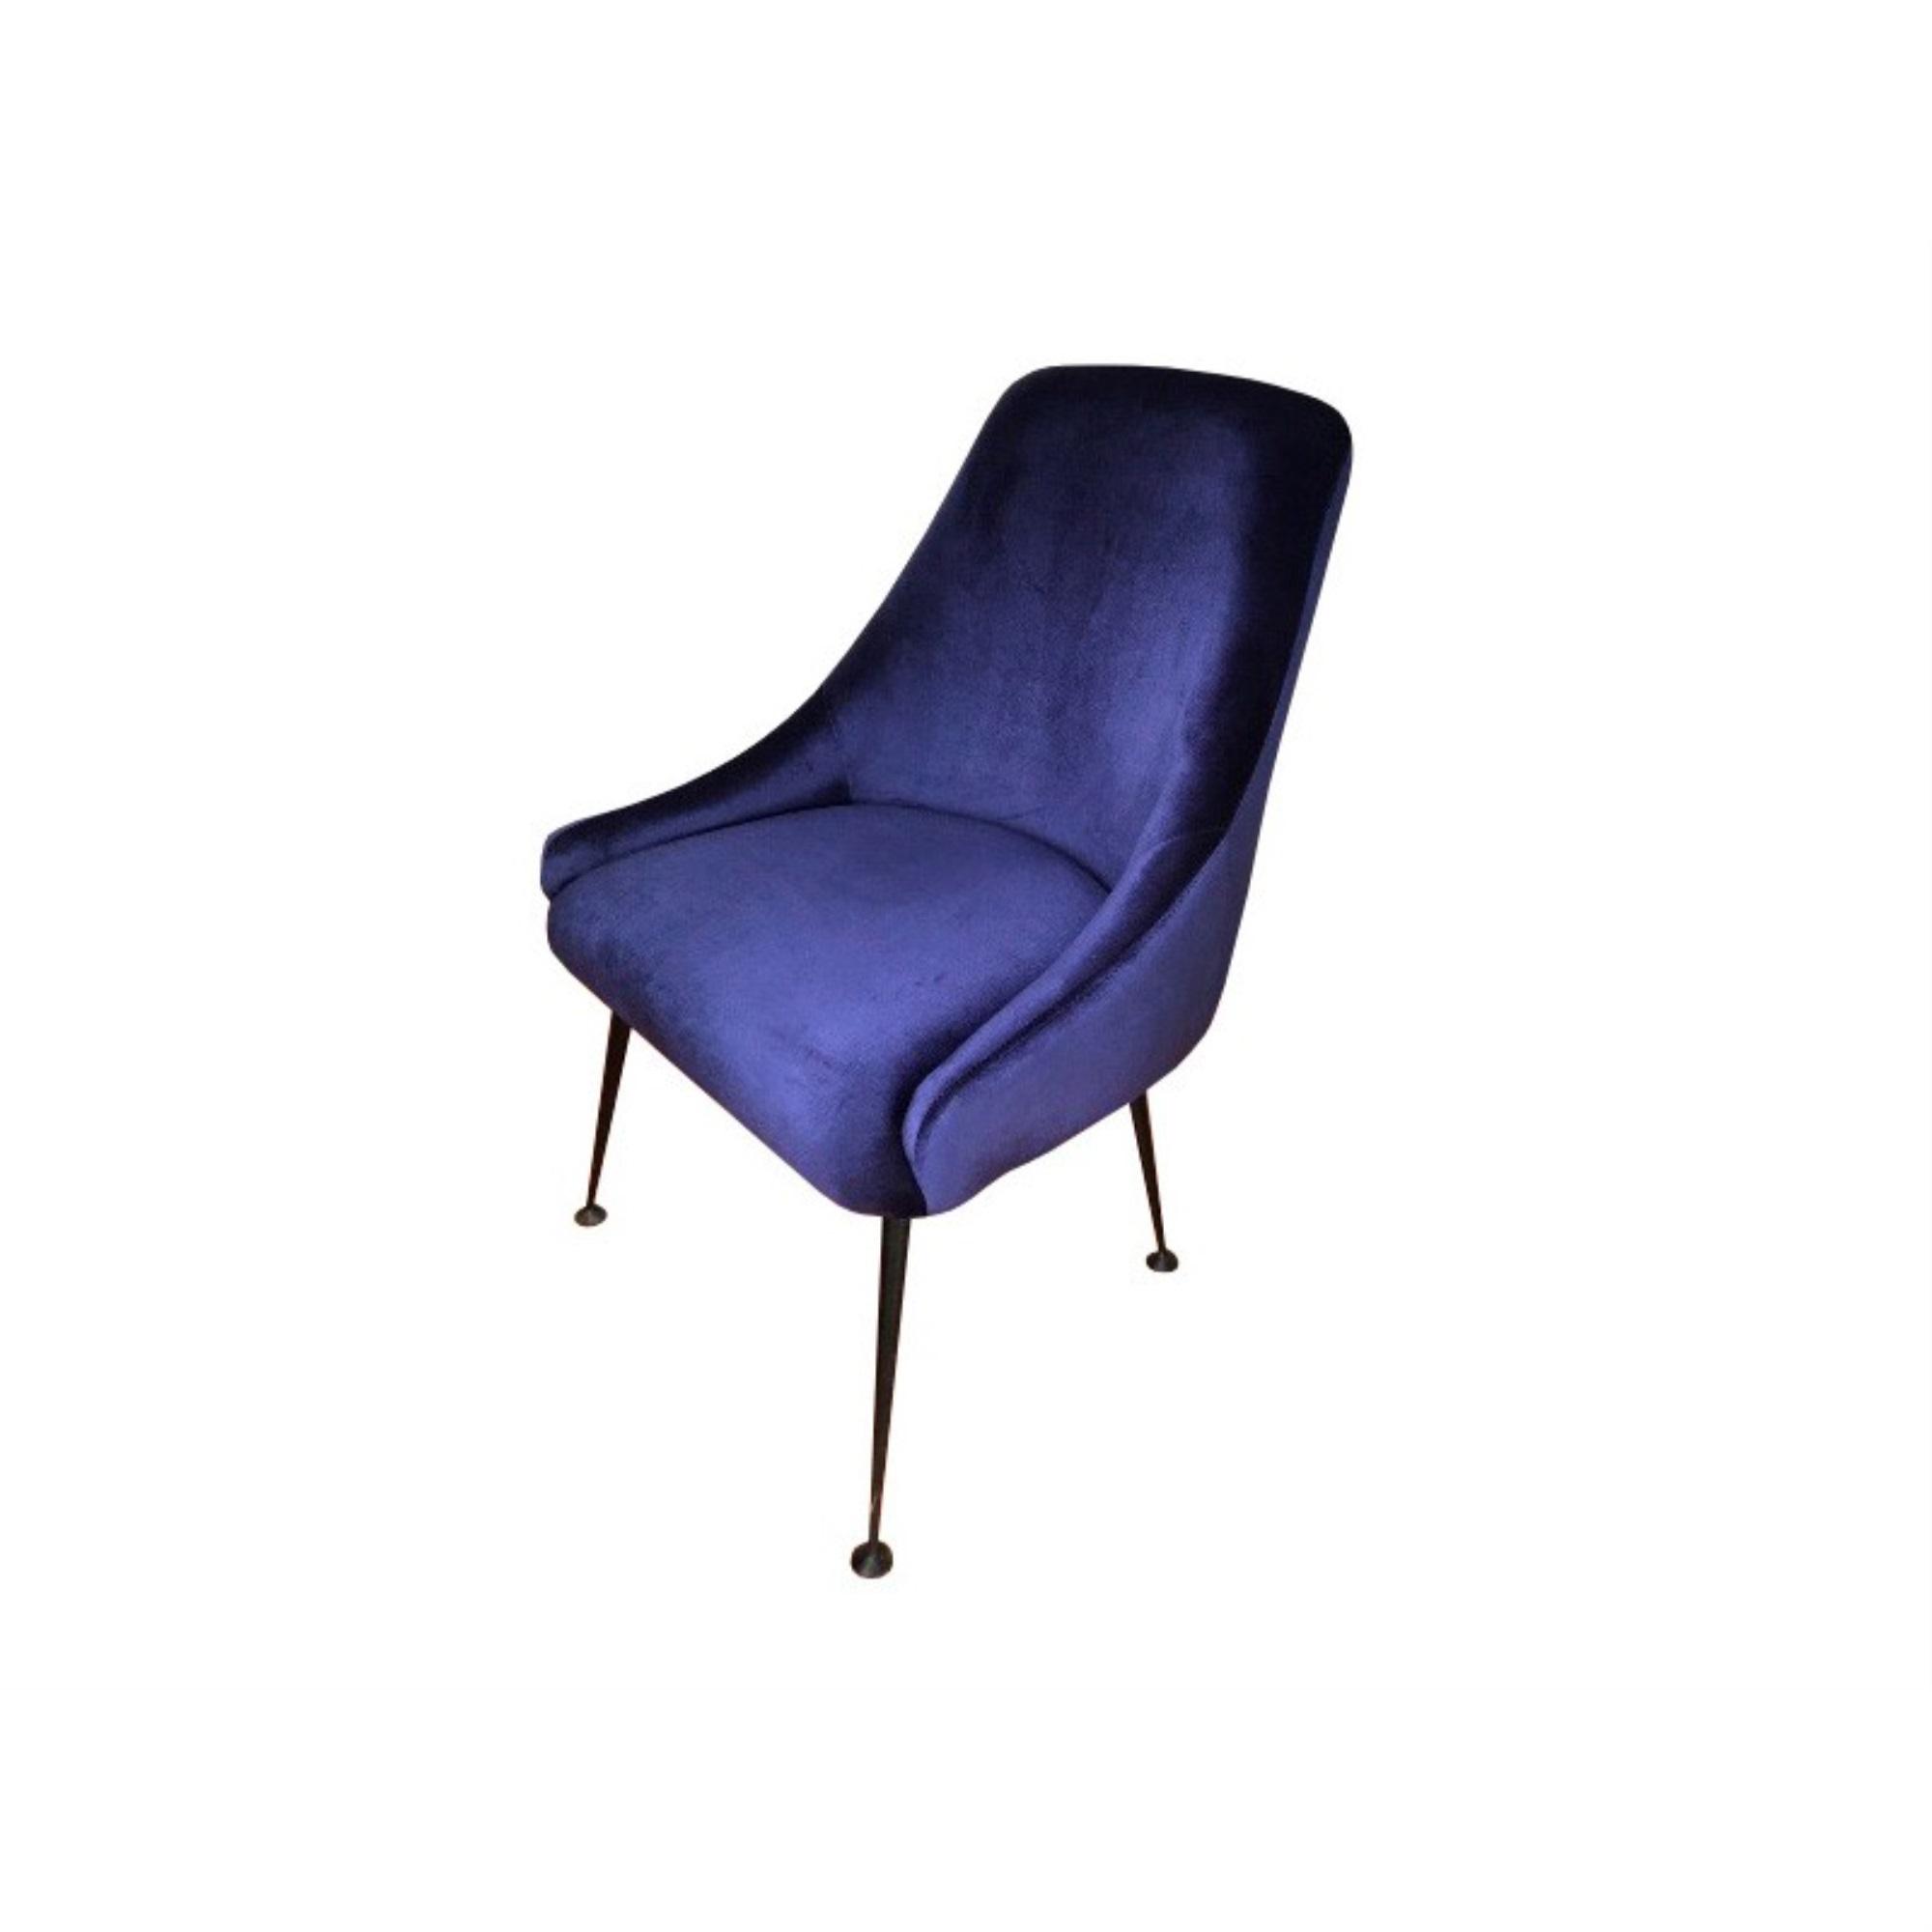 "23"" X 25"" X 35"" Cobalt Blue And Matte Black Metal Chair"